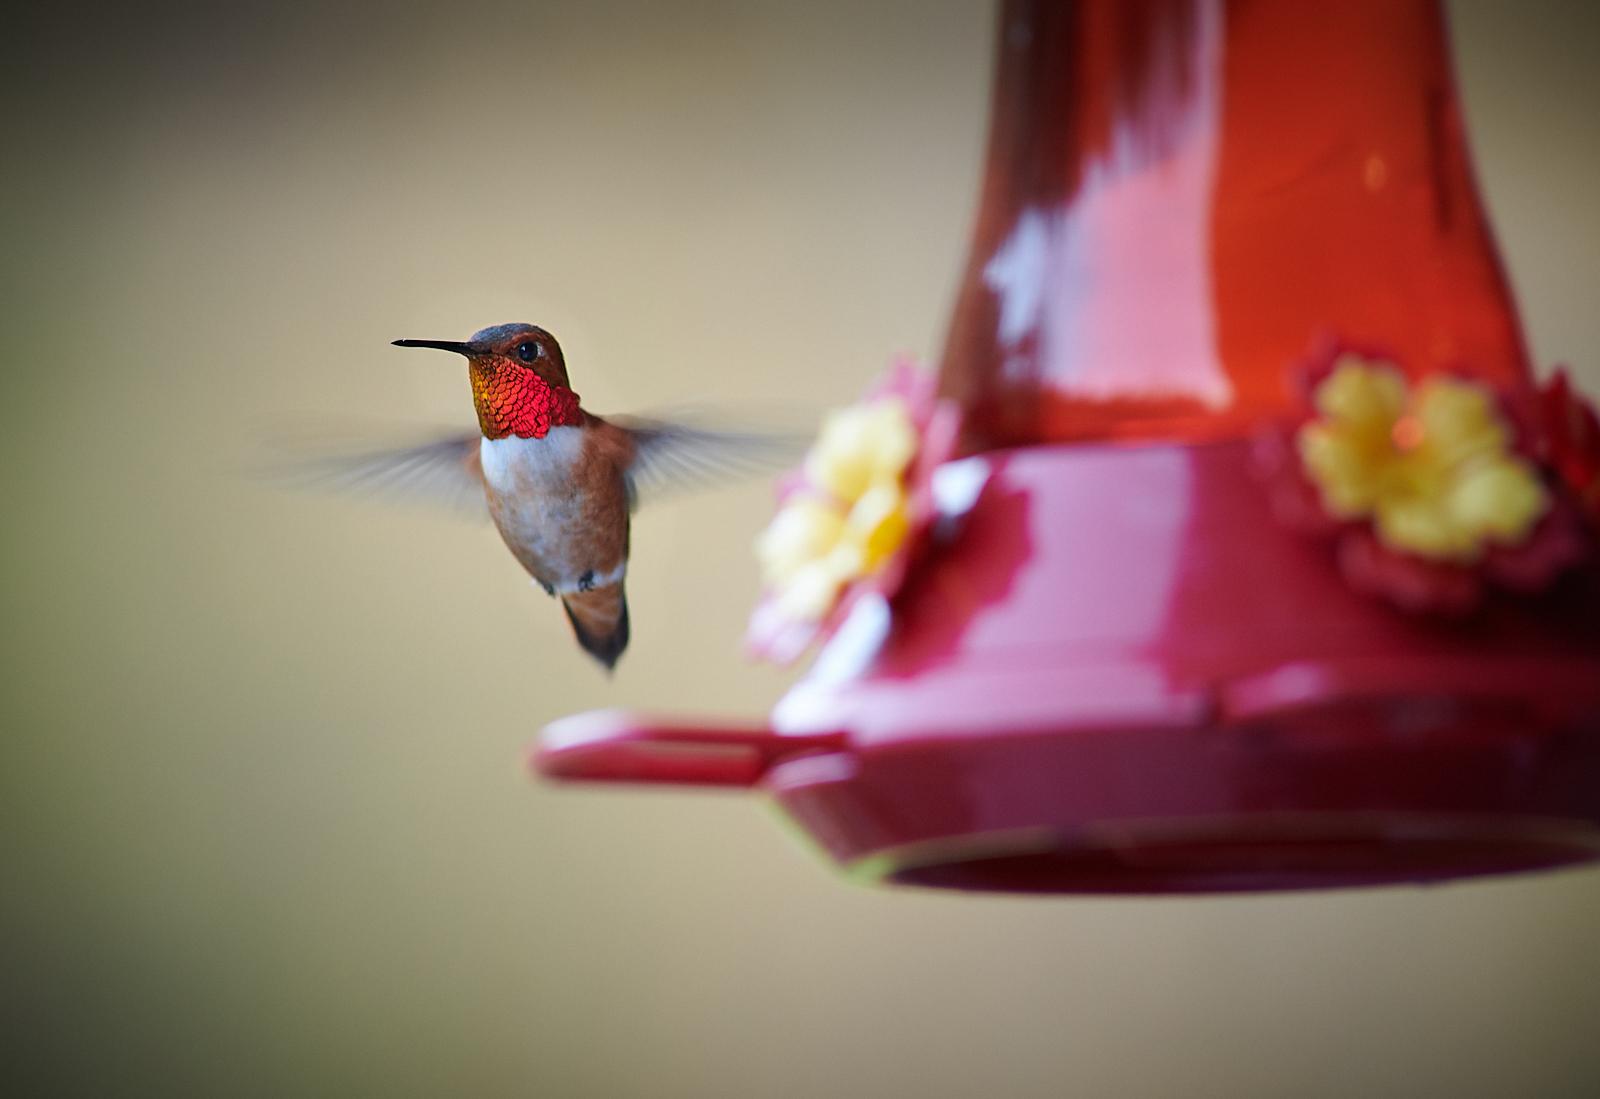 Hummingbirds Return